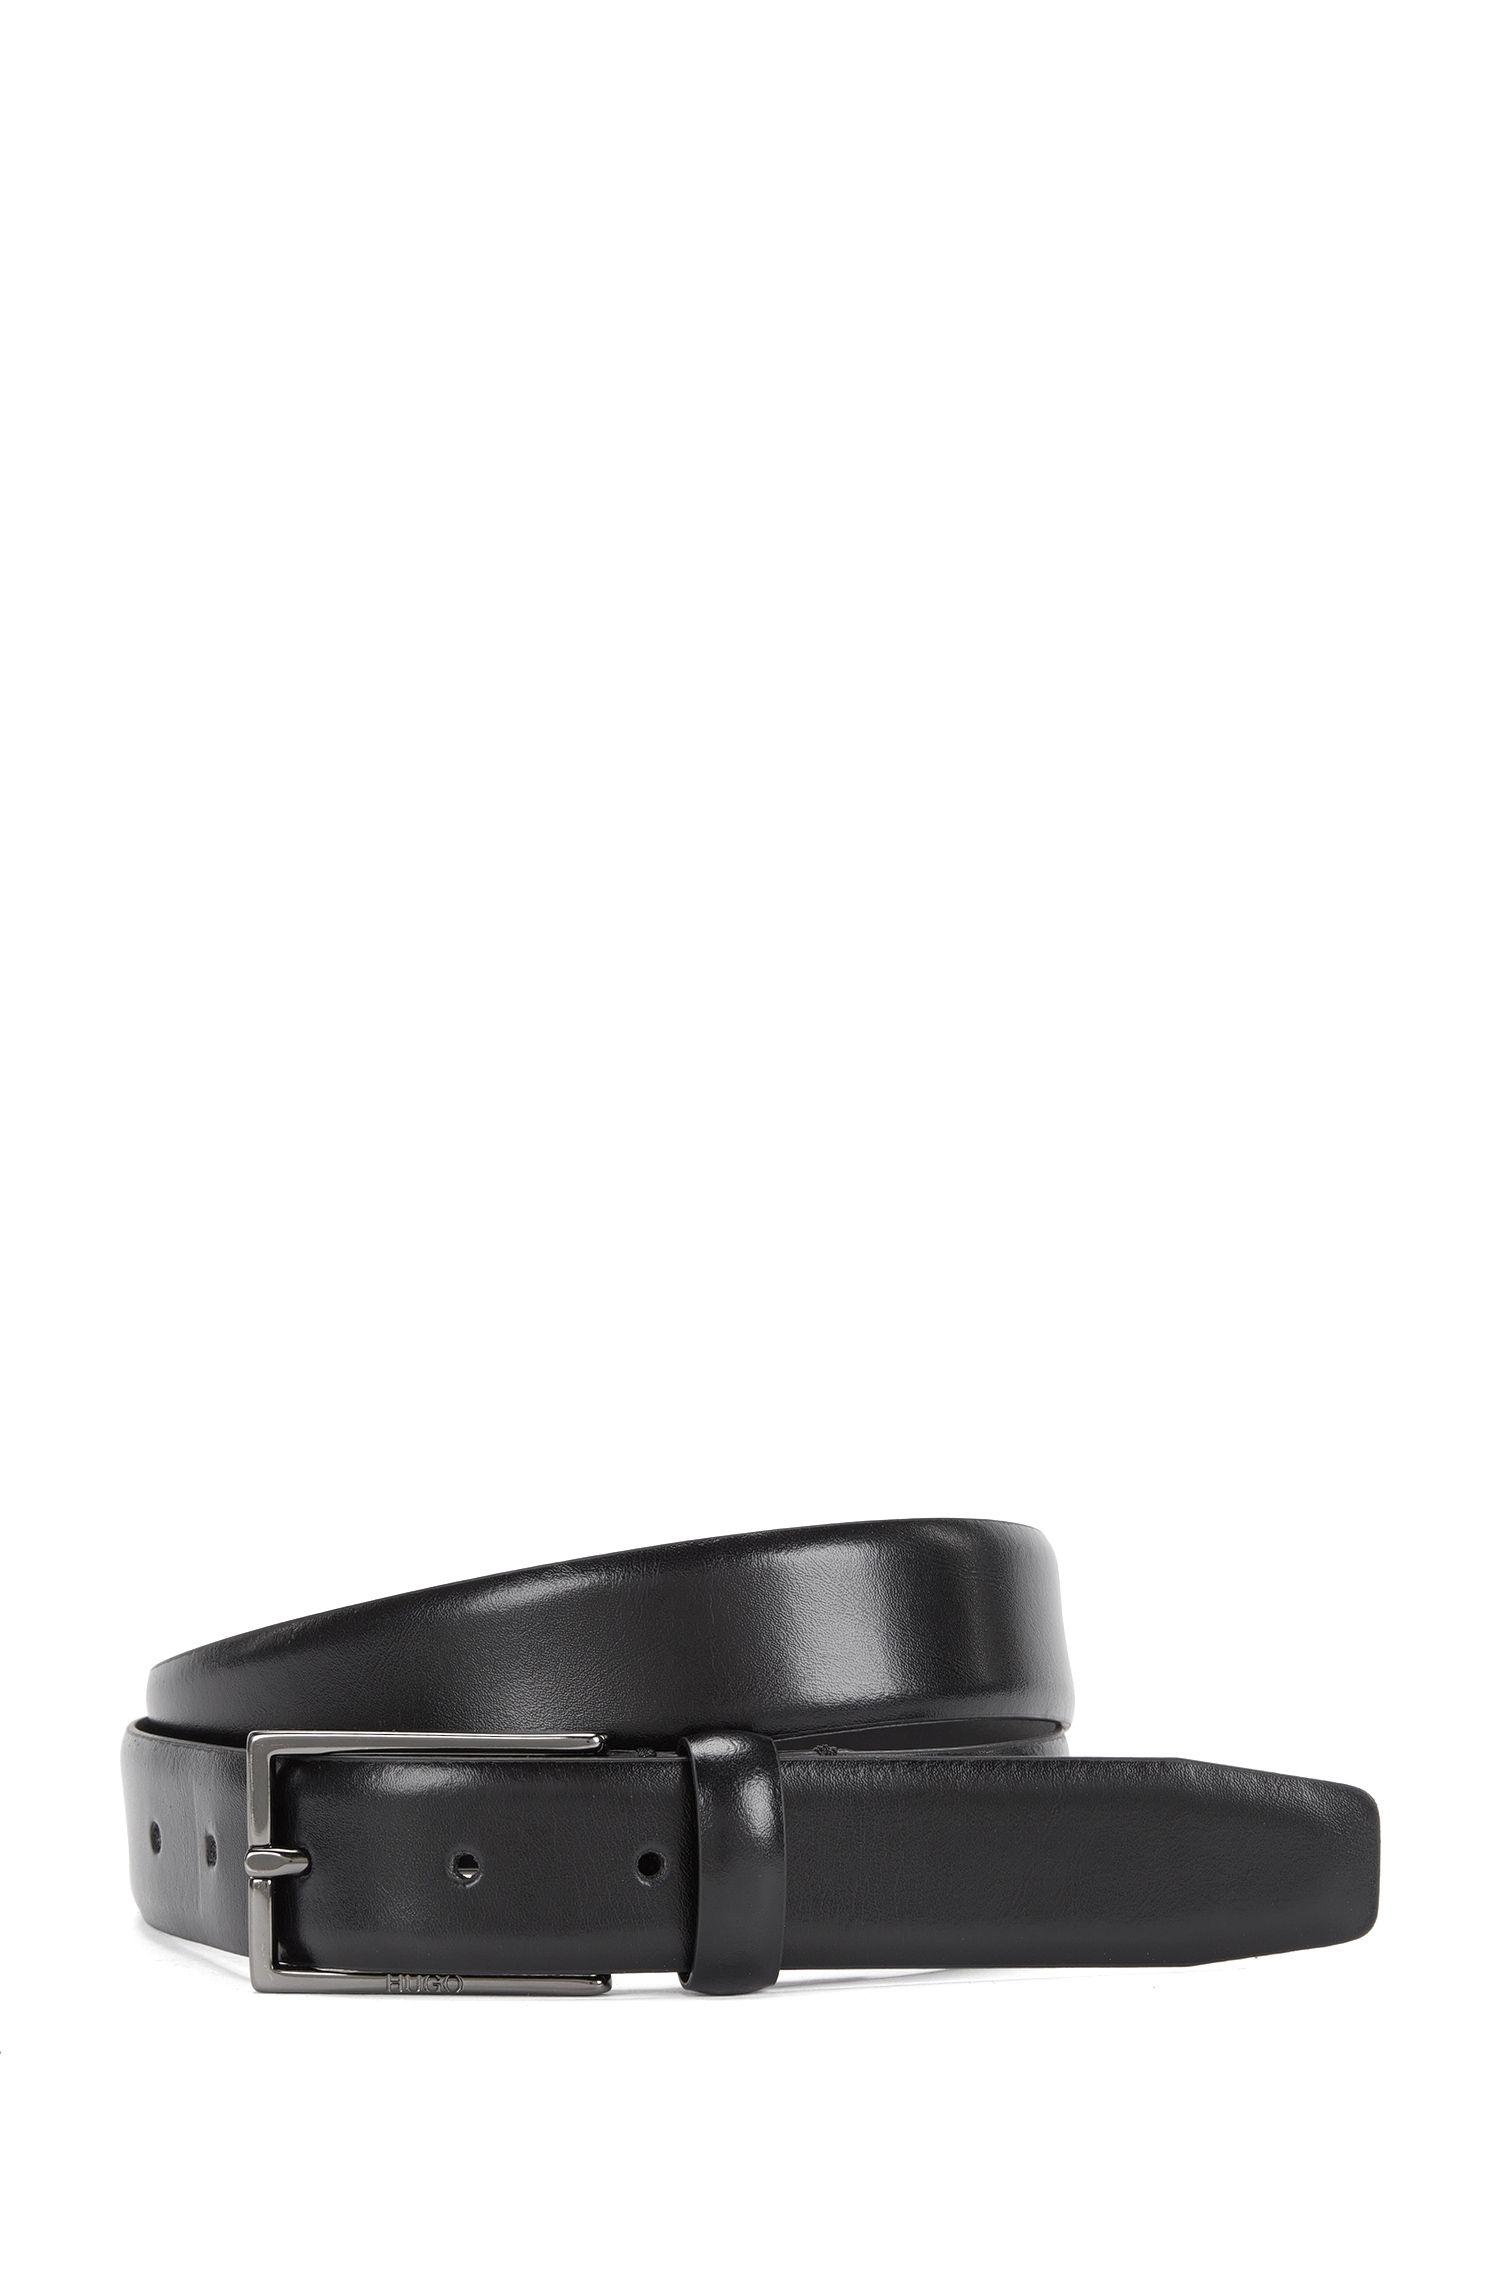 'Ganticus Sz Itpl' | Italian Leather Belt